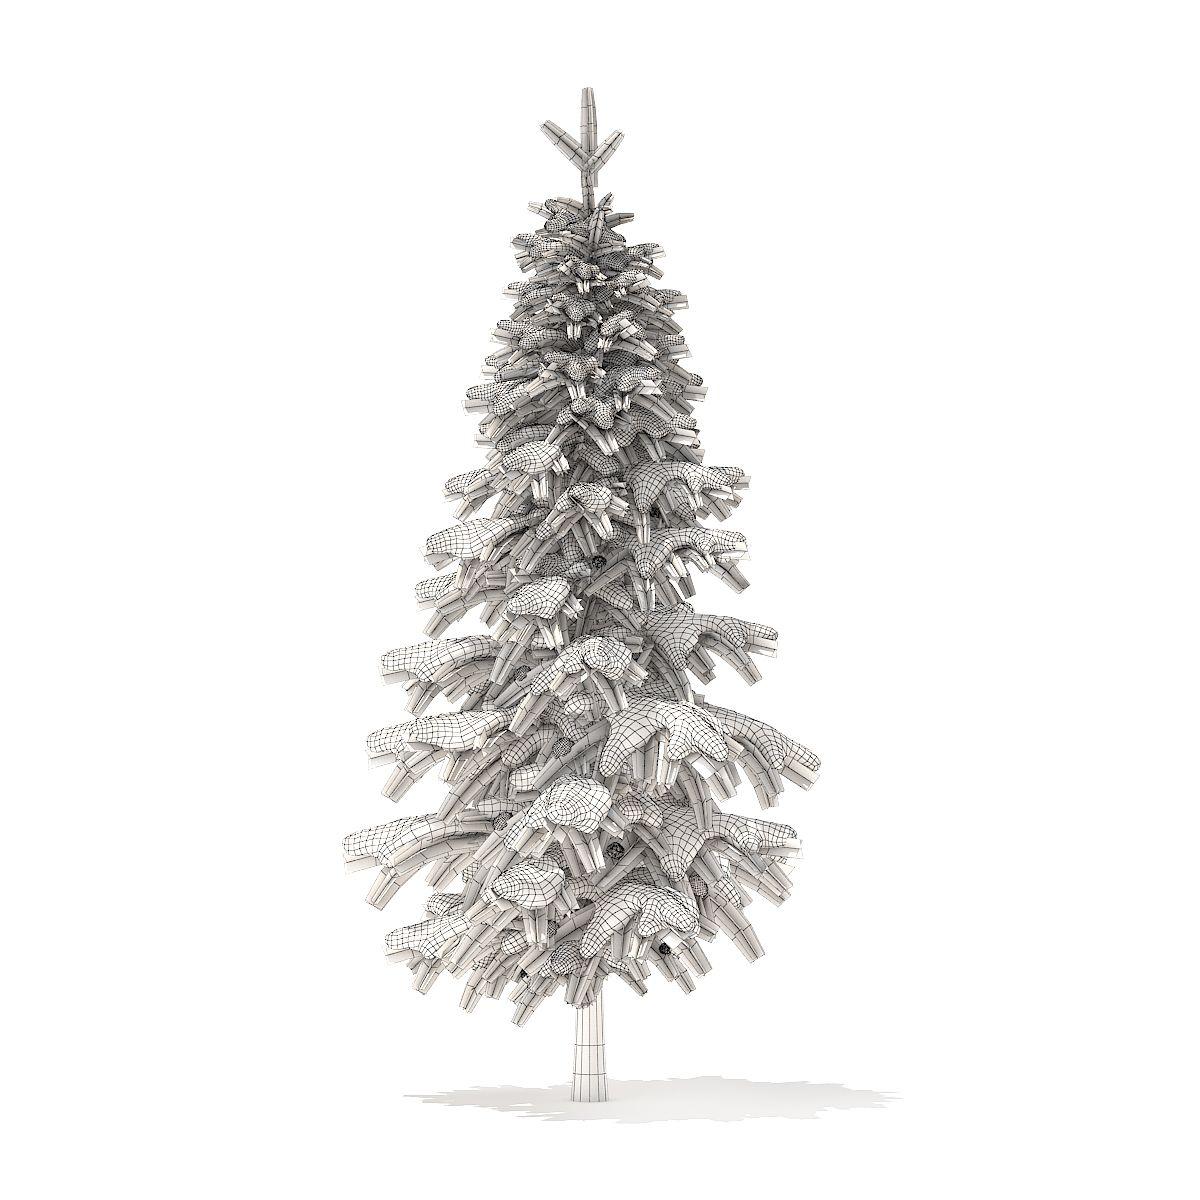 Fir Tree With Snow 3d Model 2 6m Fir Tree Tree 3d Model